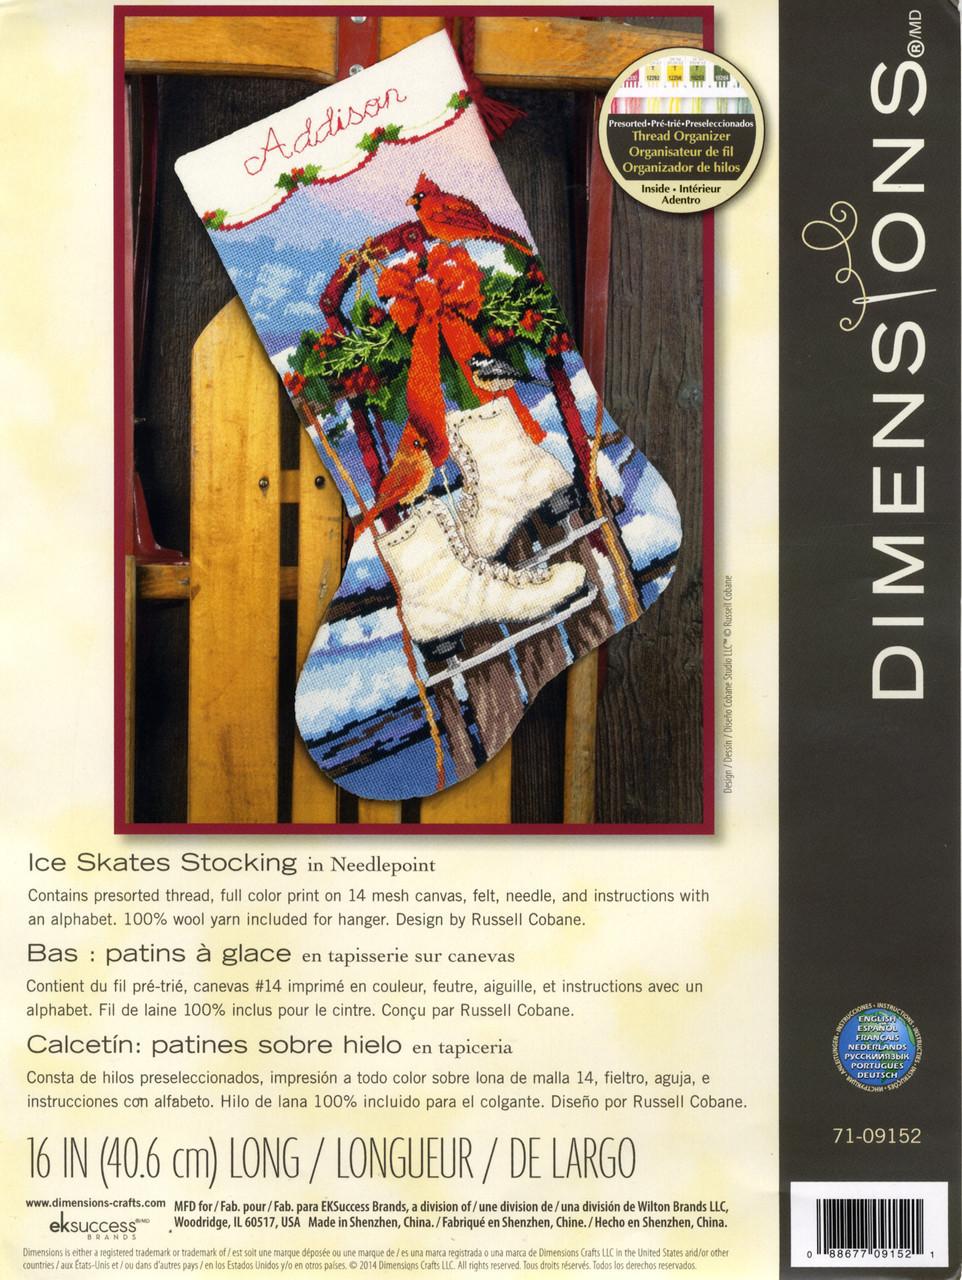 Dimensions - Ice Skates Stocking